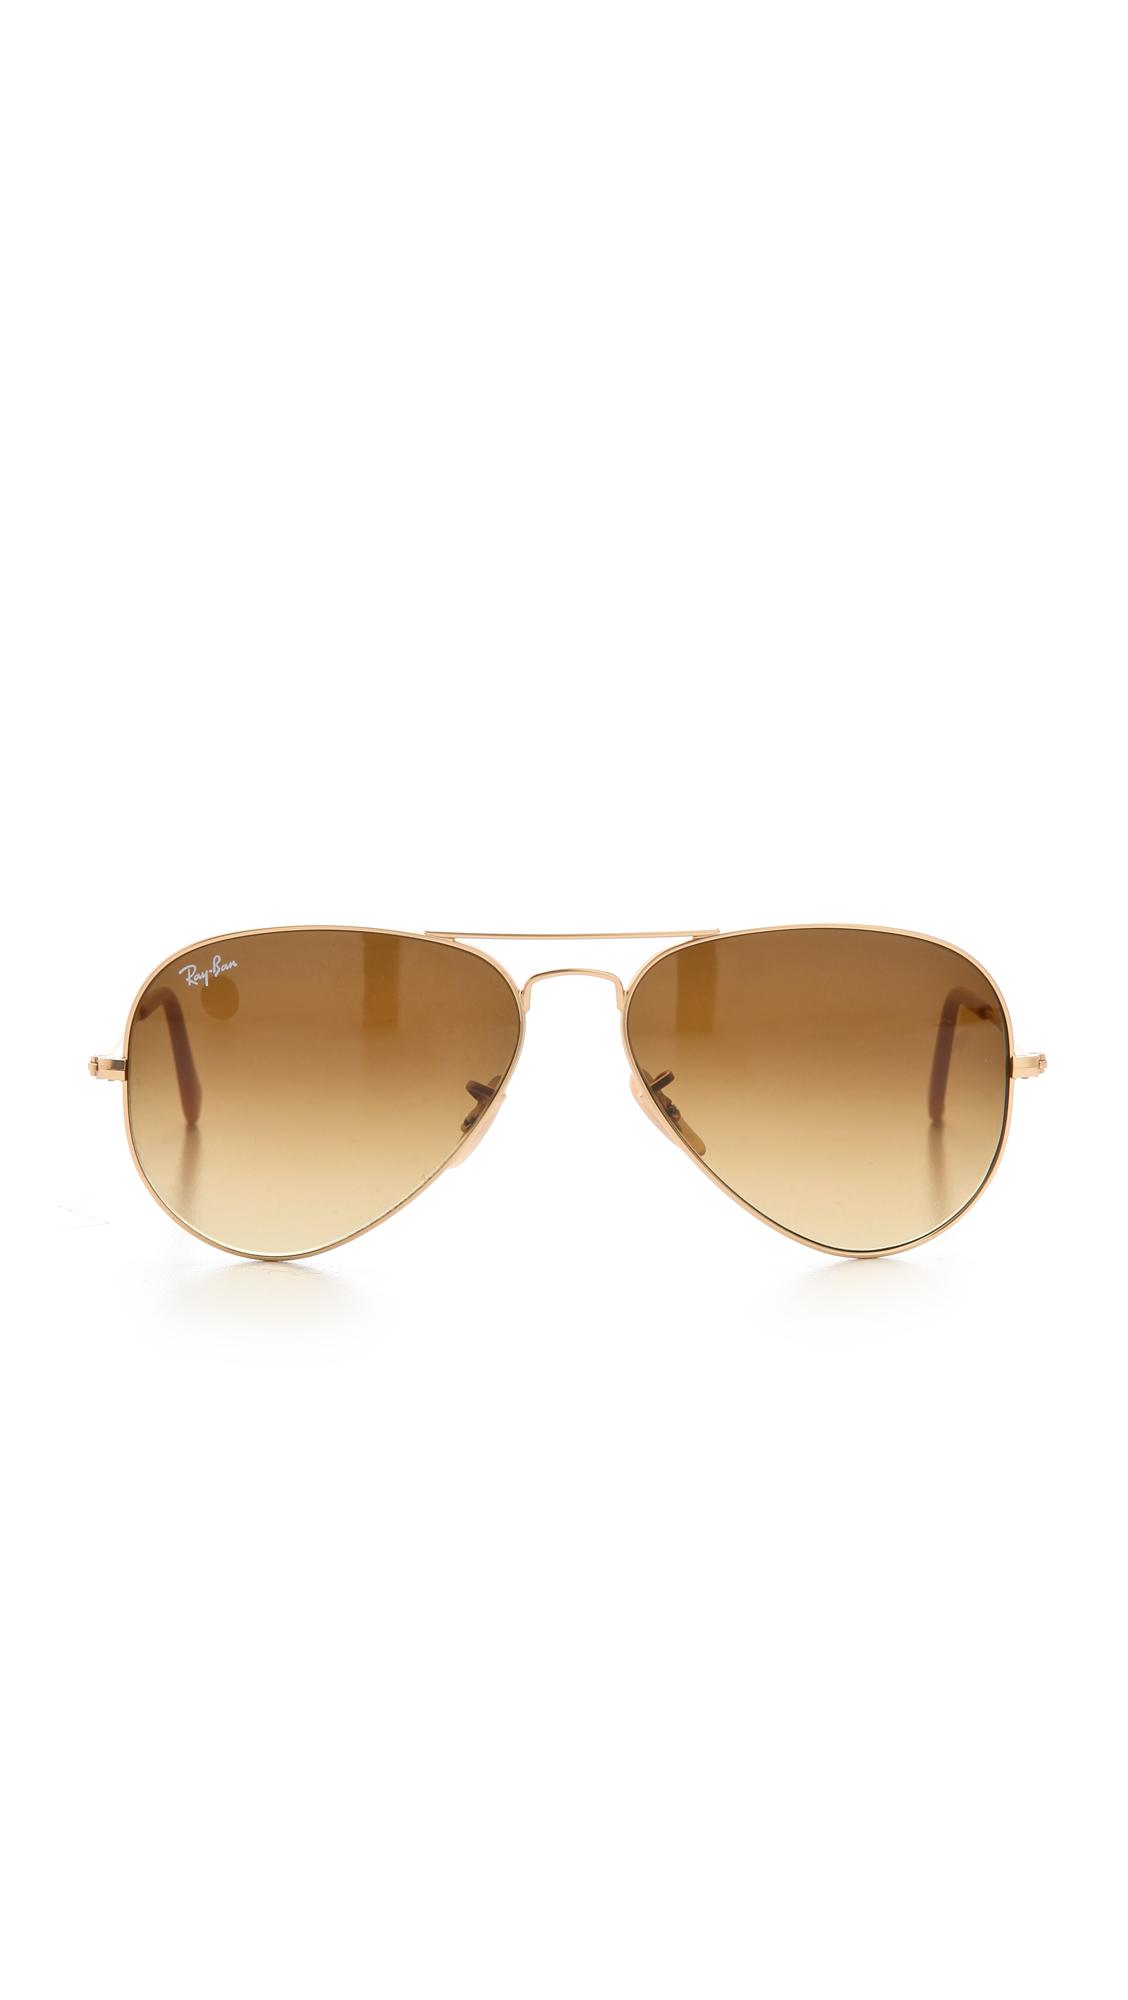 Ray-Ban Matte Classic Aviator Sunglasses | SHOPBOP